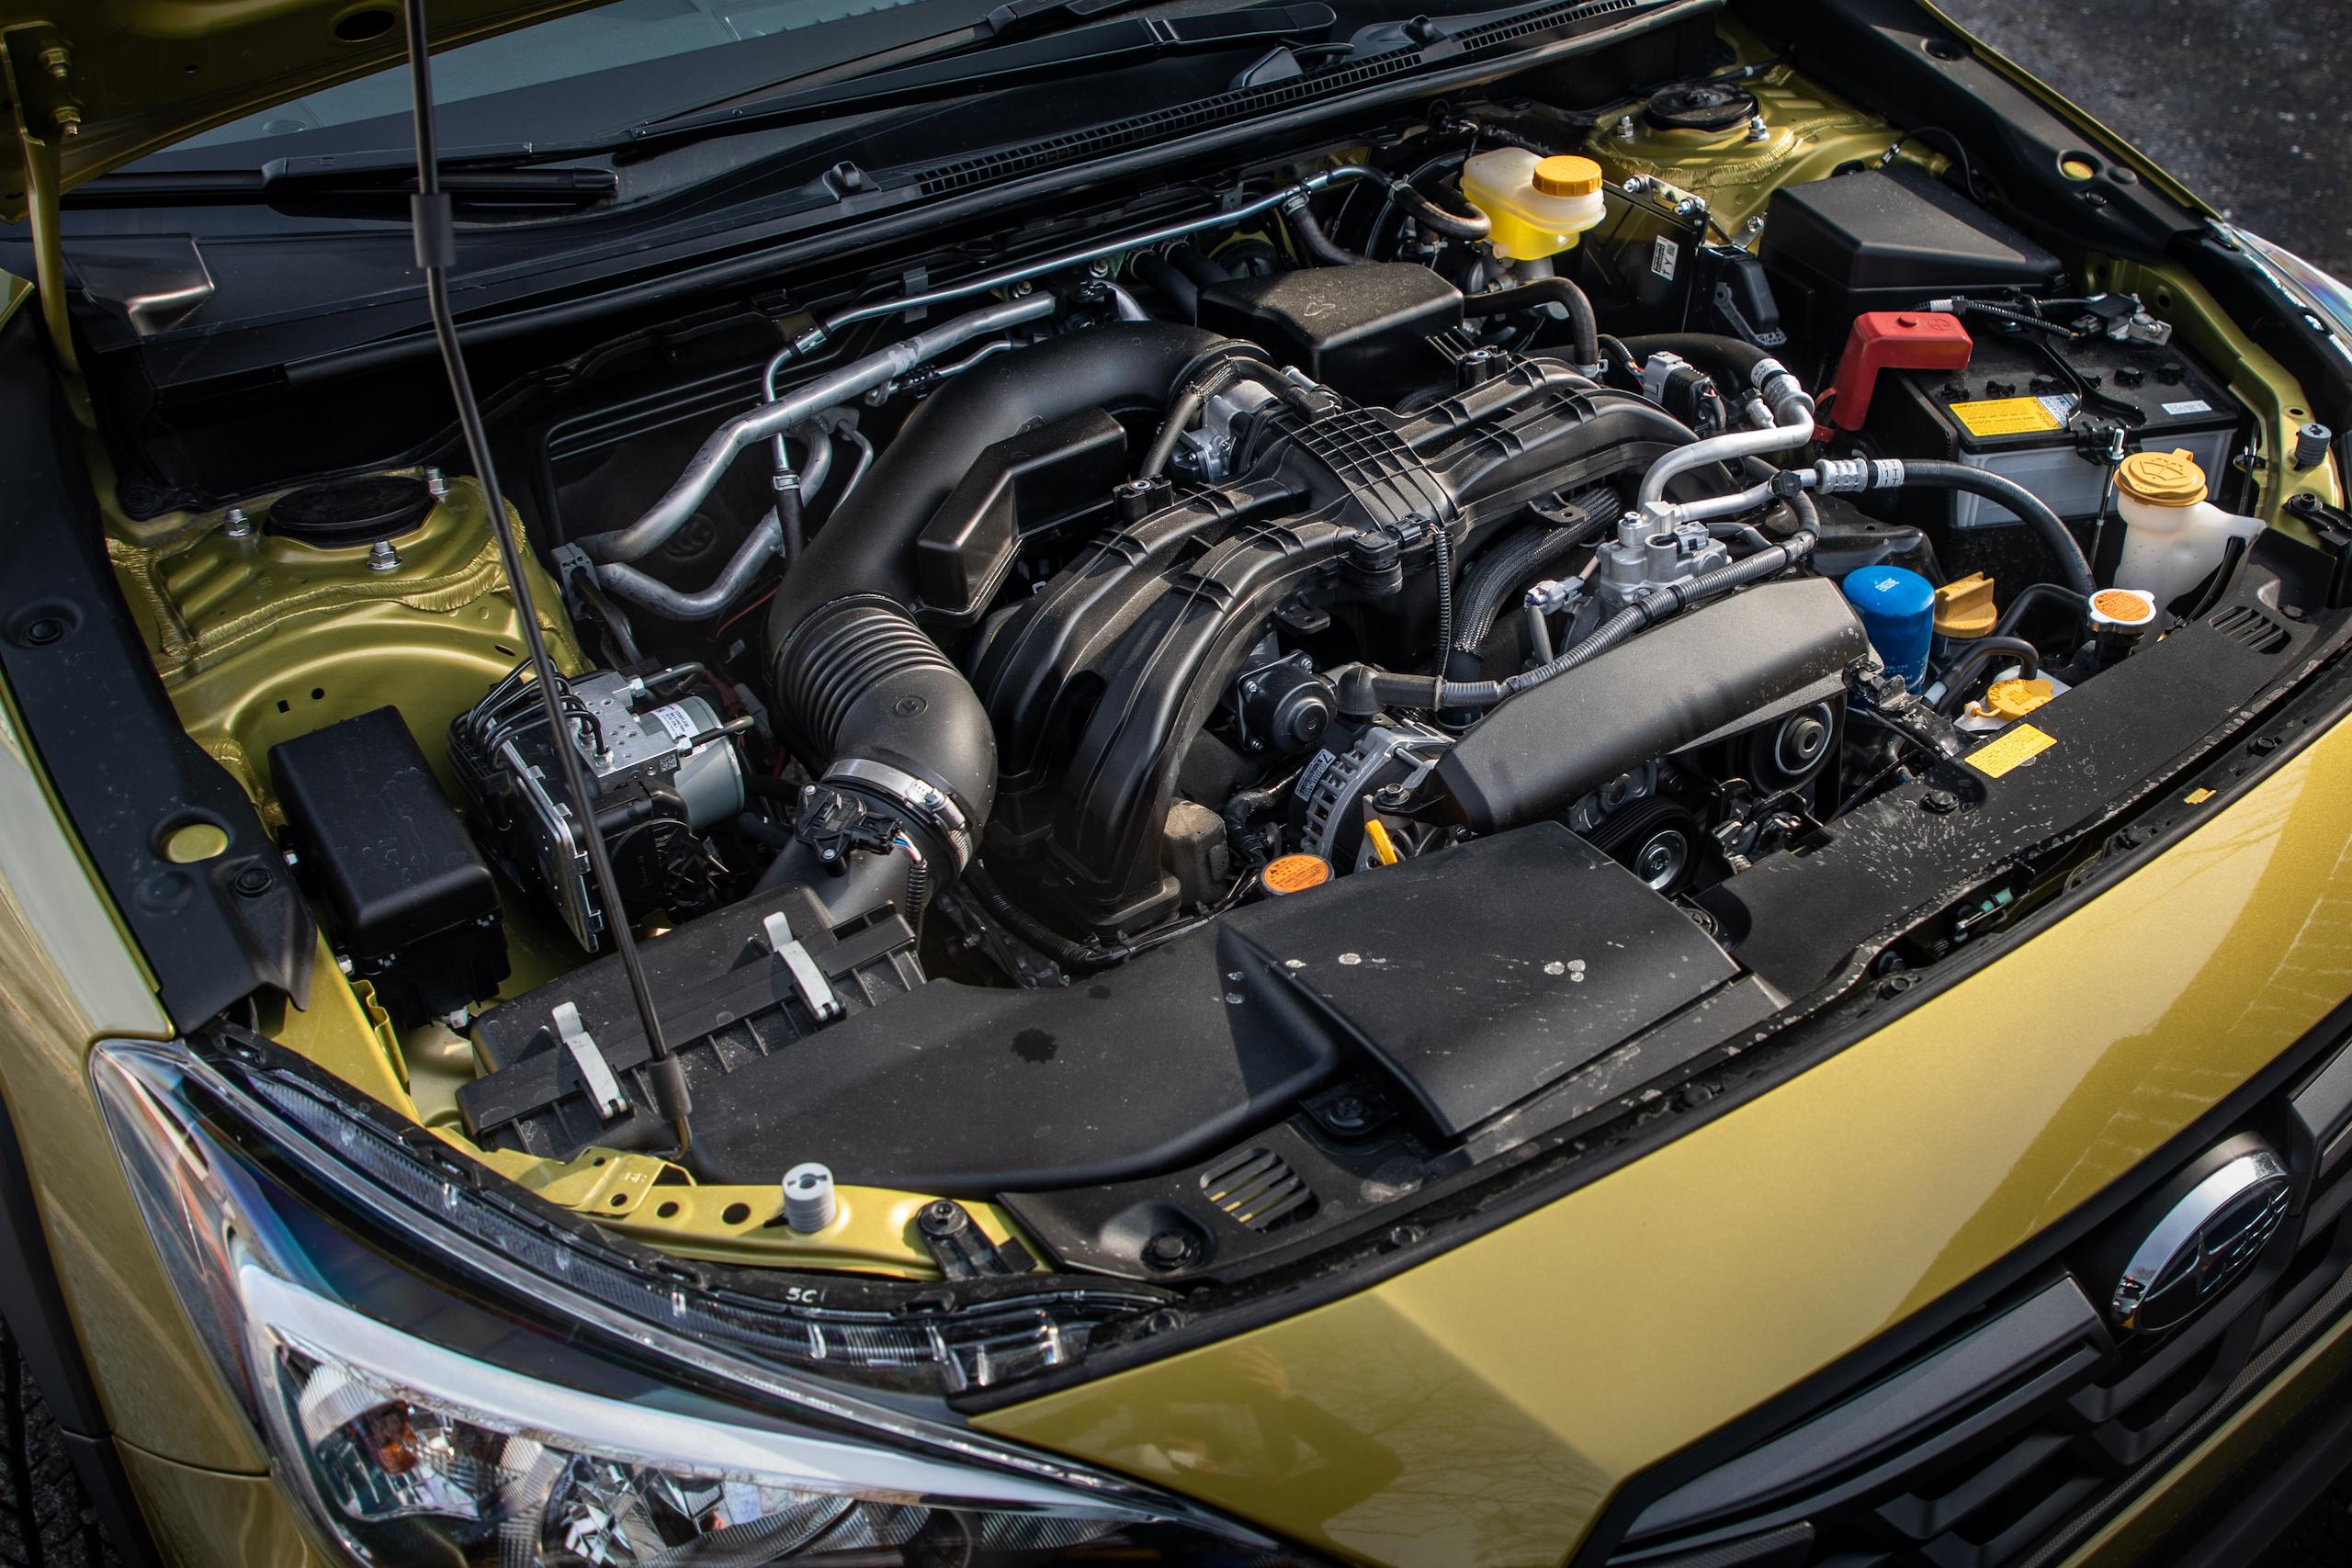 Subaru Crosstrek Sport engine bay angle